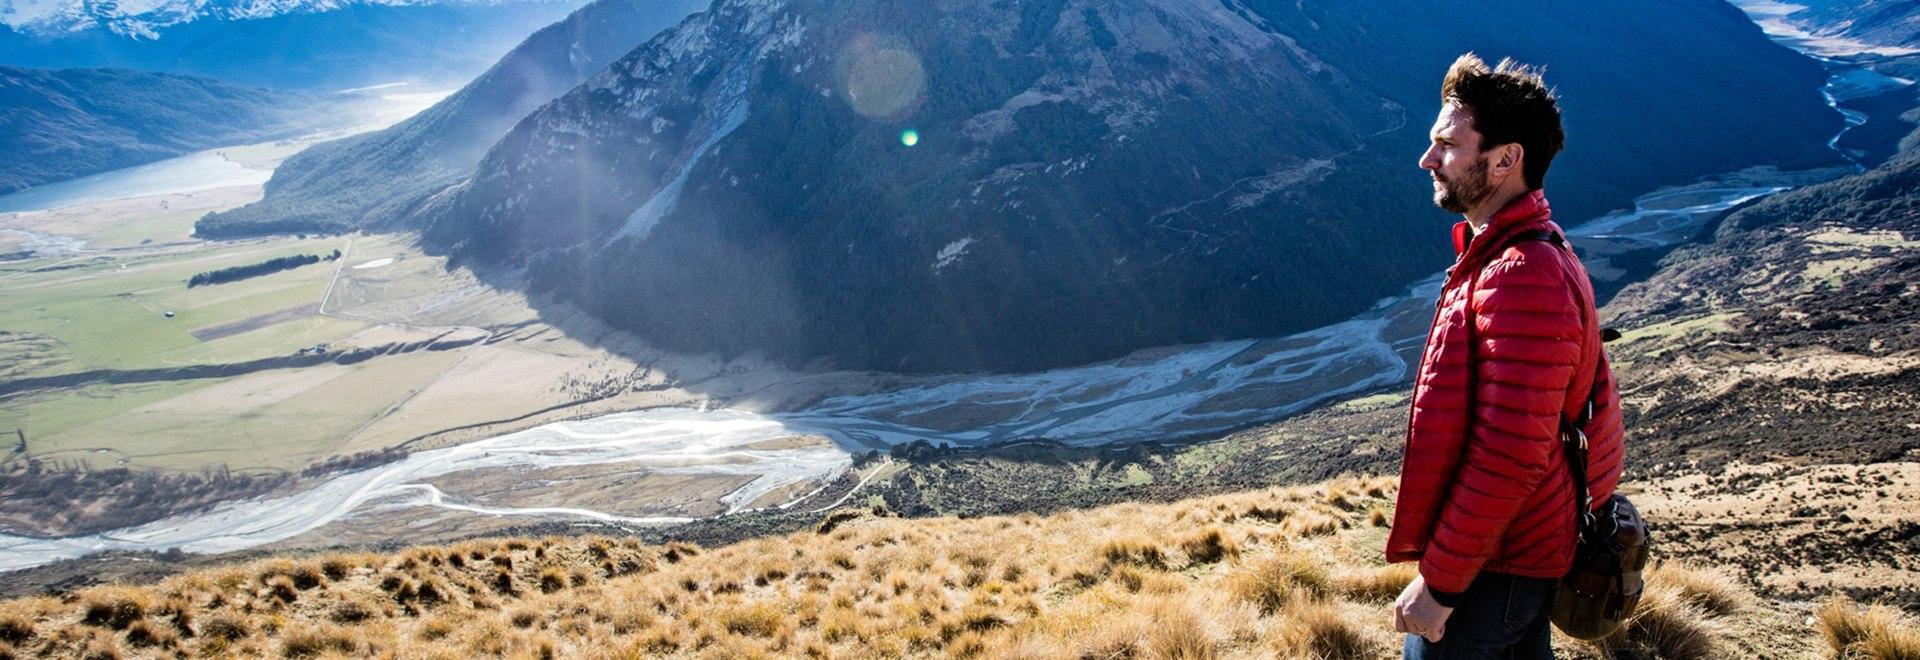 Patagonia: una storia d'amore